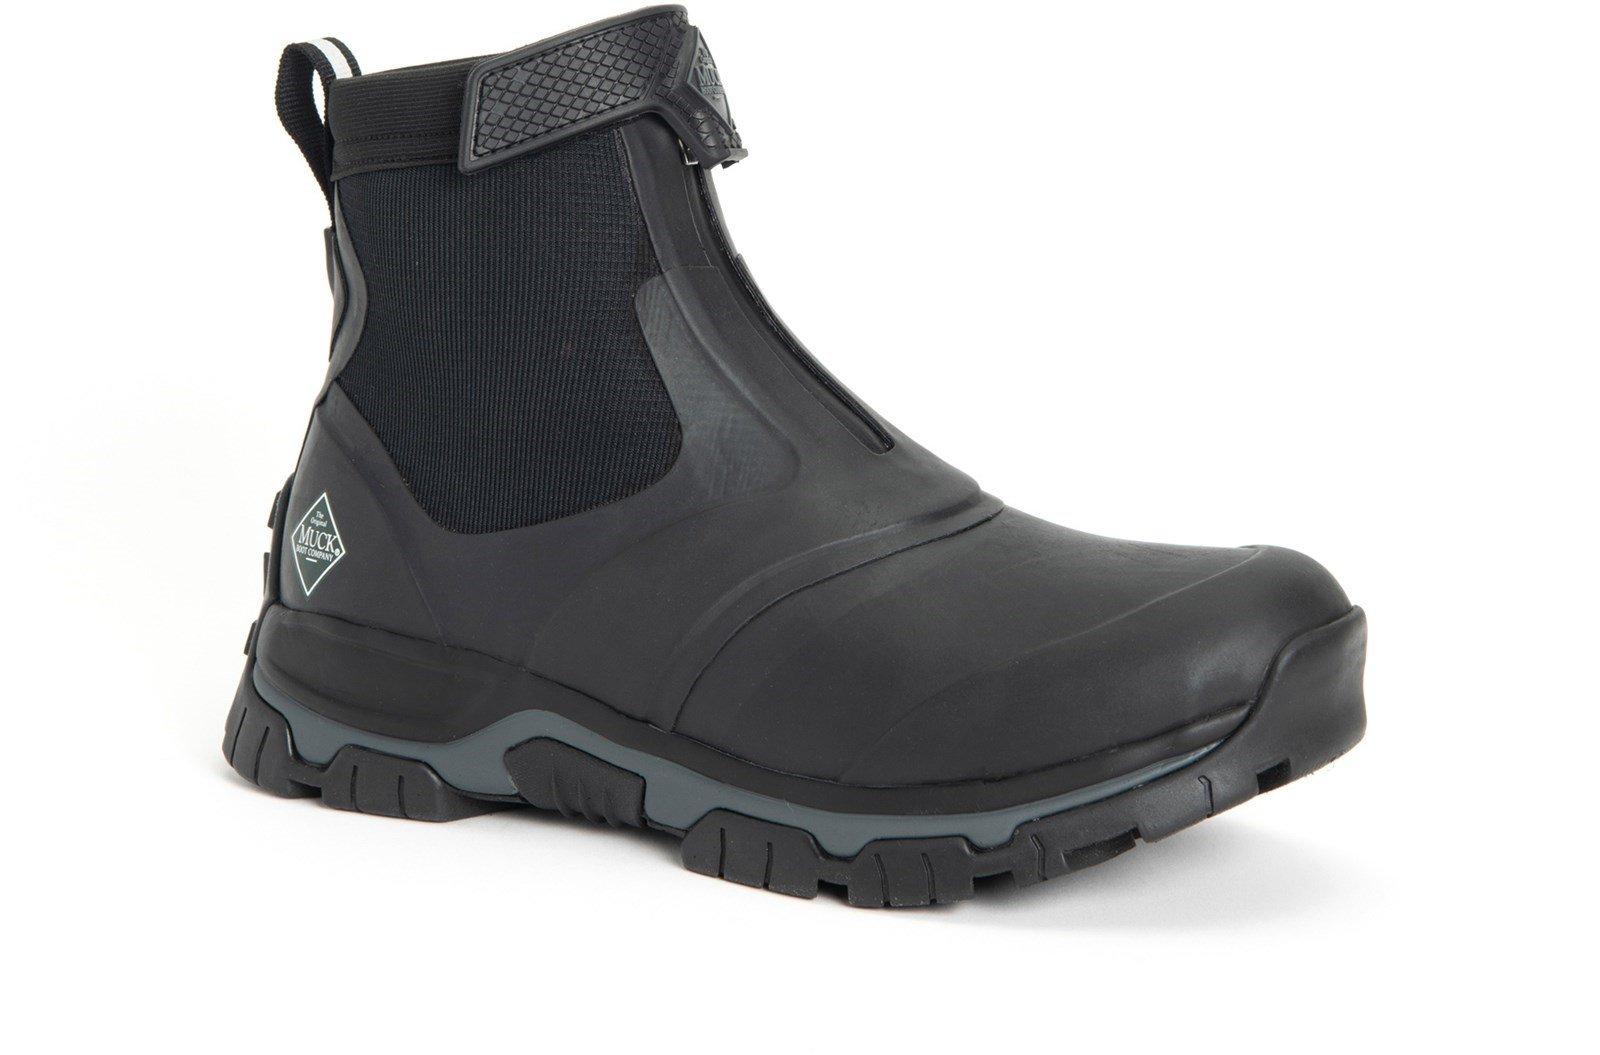 Muck Boots Unisex Apex Mid Zip Boot Various Colours 30981 - Black/Dark Shadow 6